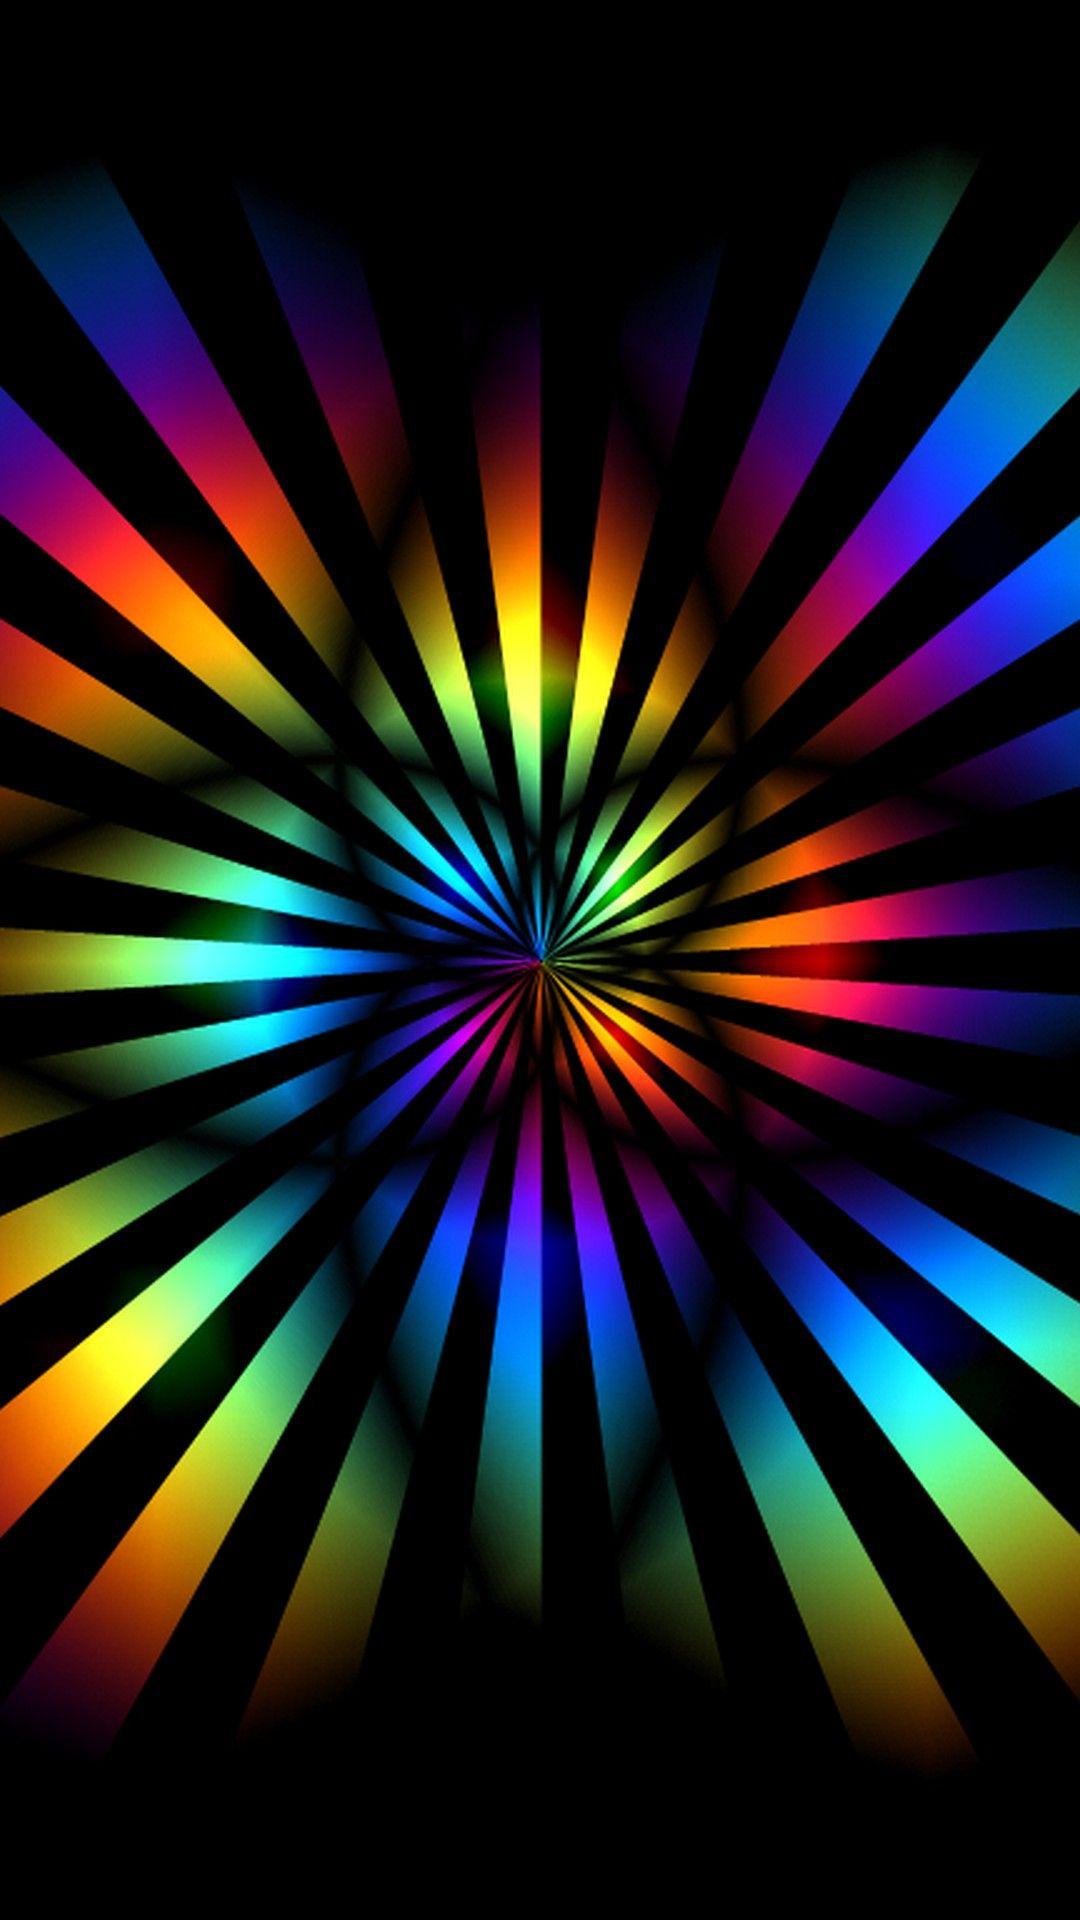 Rainbow iPhone Rainbow wallpaper, Iphone wallpaper